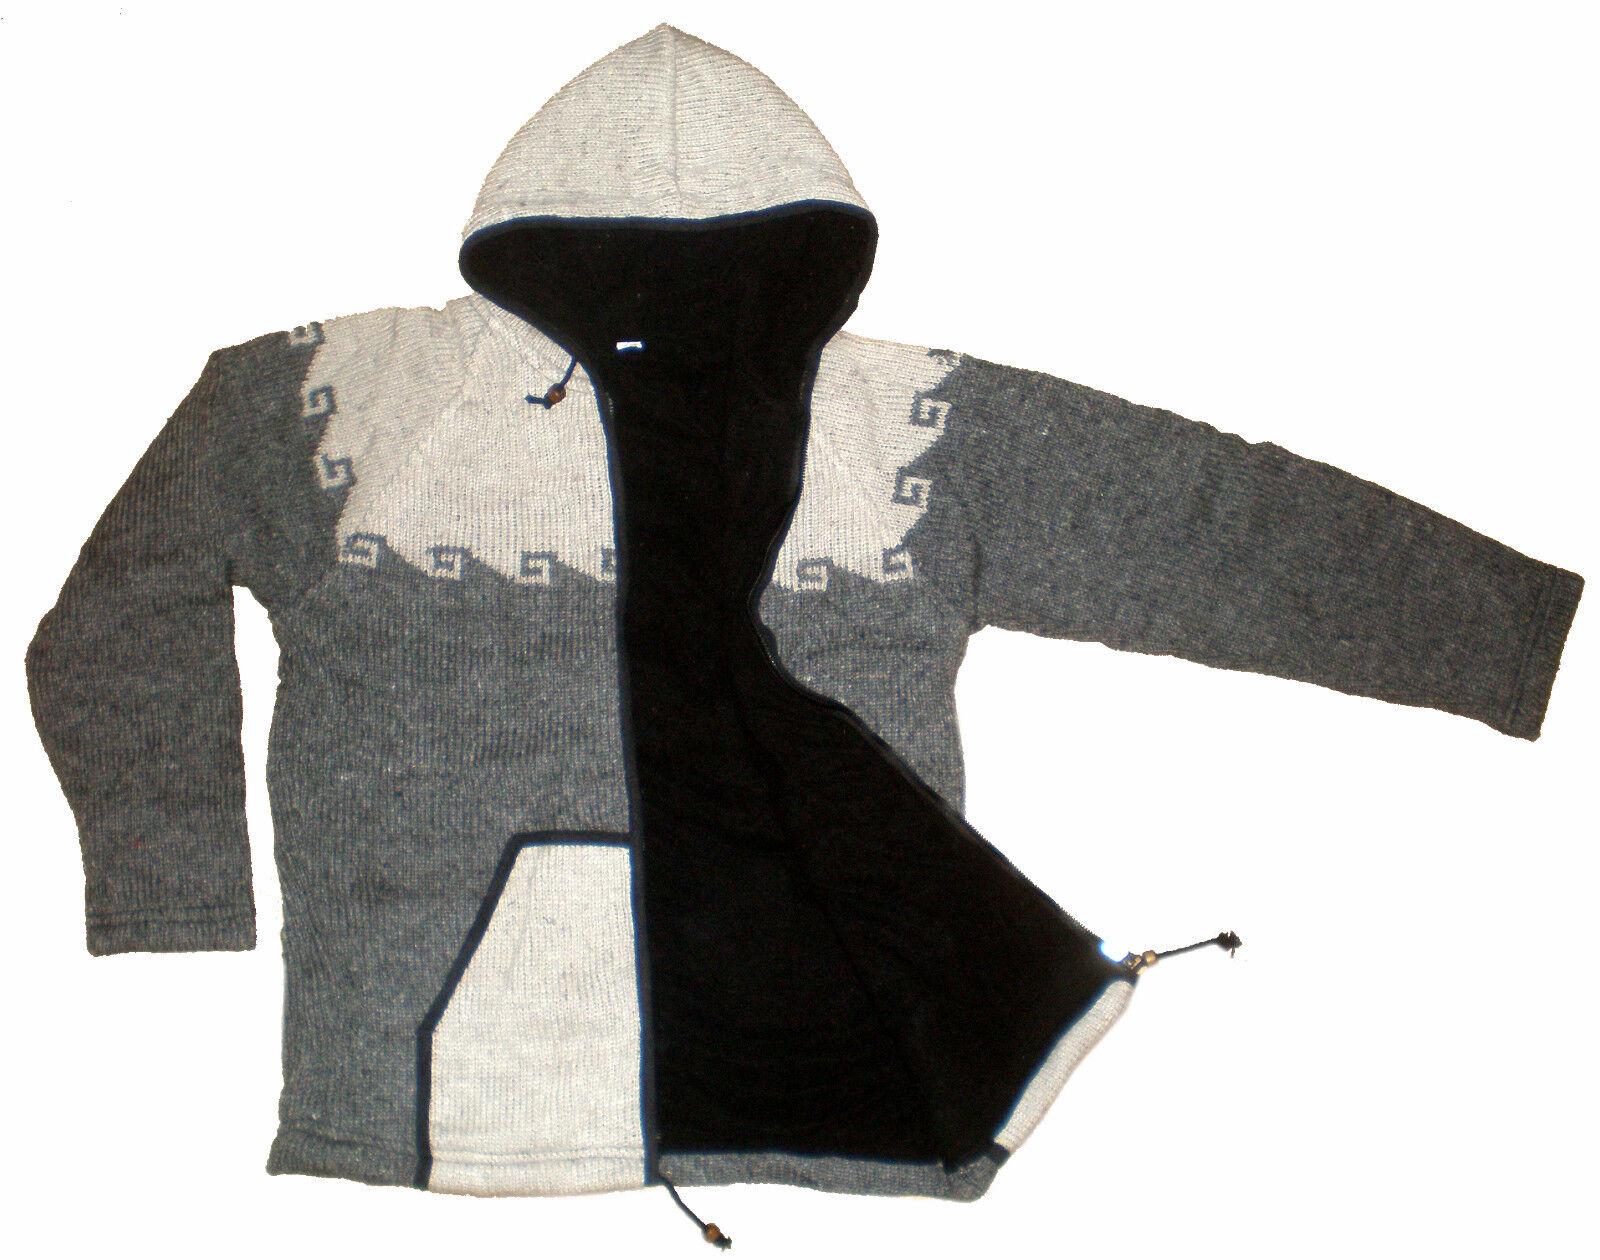 HAND KNITTED WARM WOOLLEN FLEECE WINTER SHERPA JUMPER HOODIE FROM NEPAL - MEDIUM